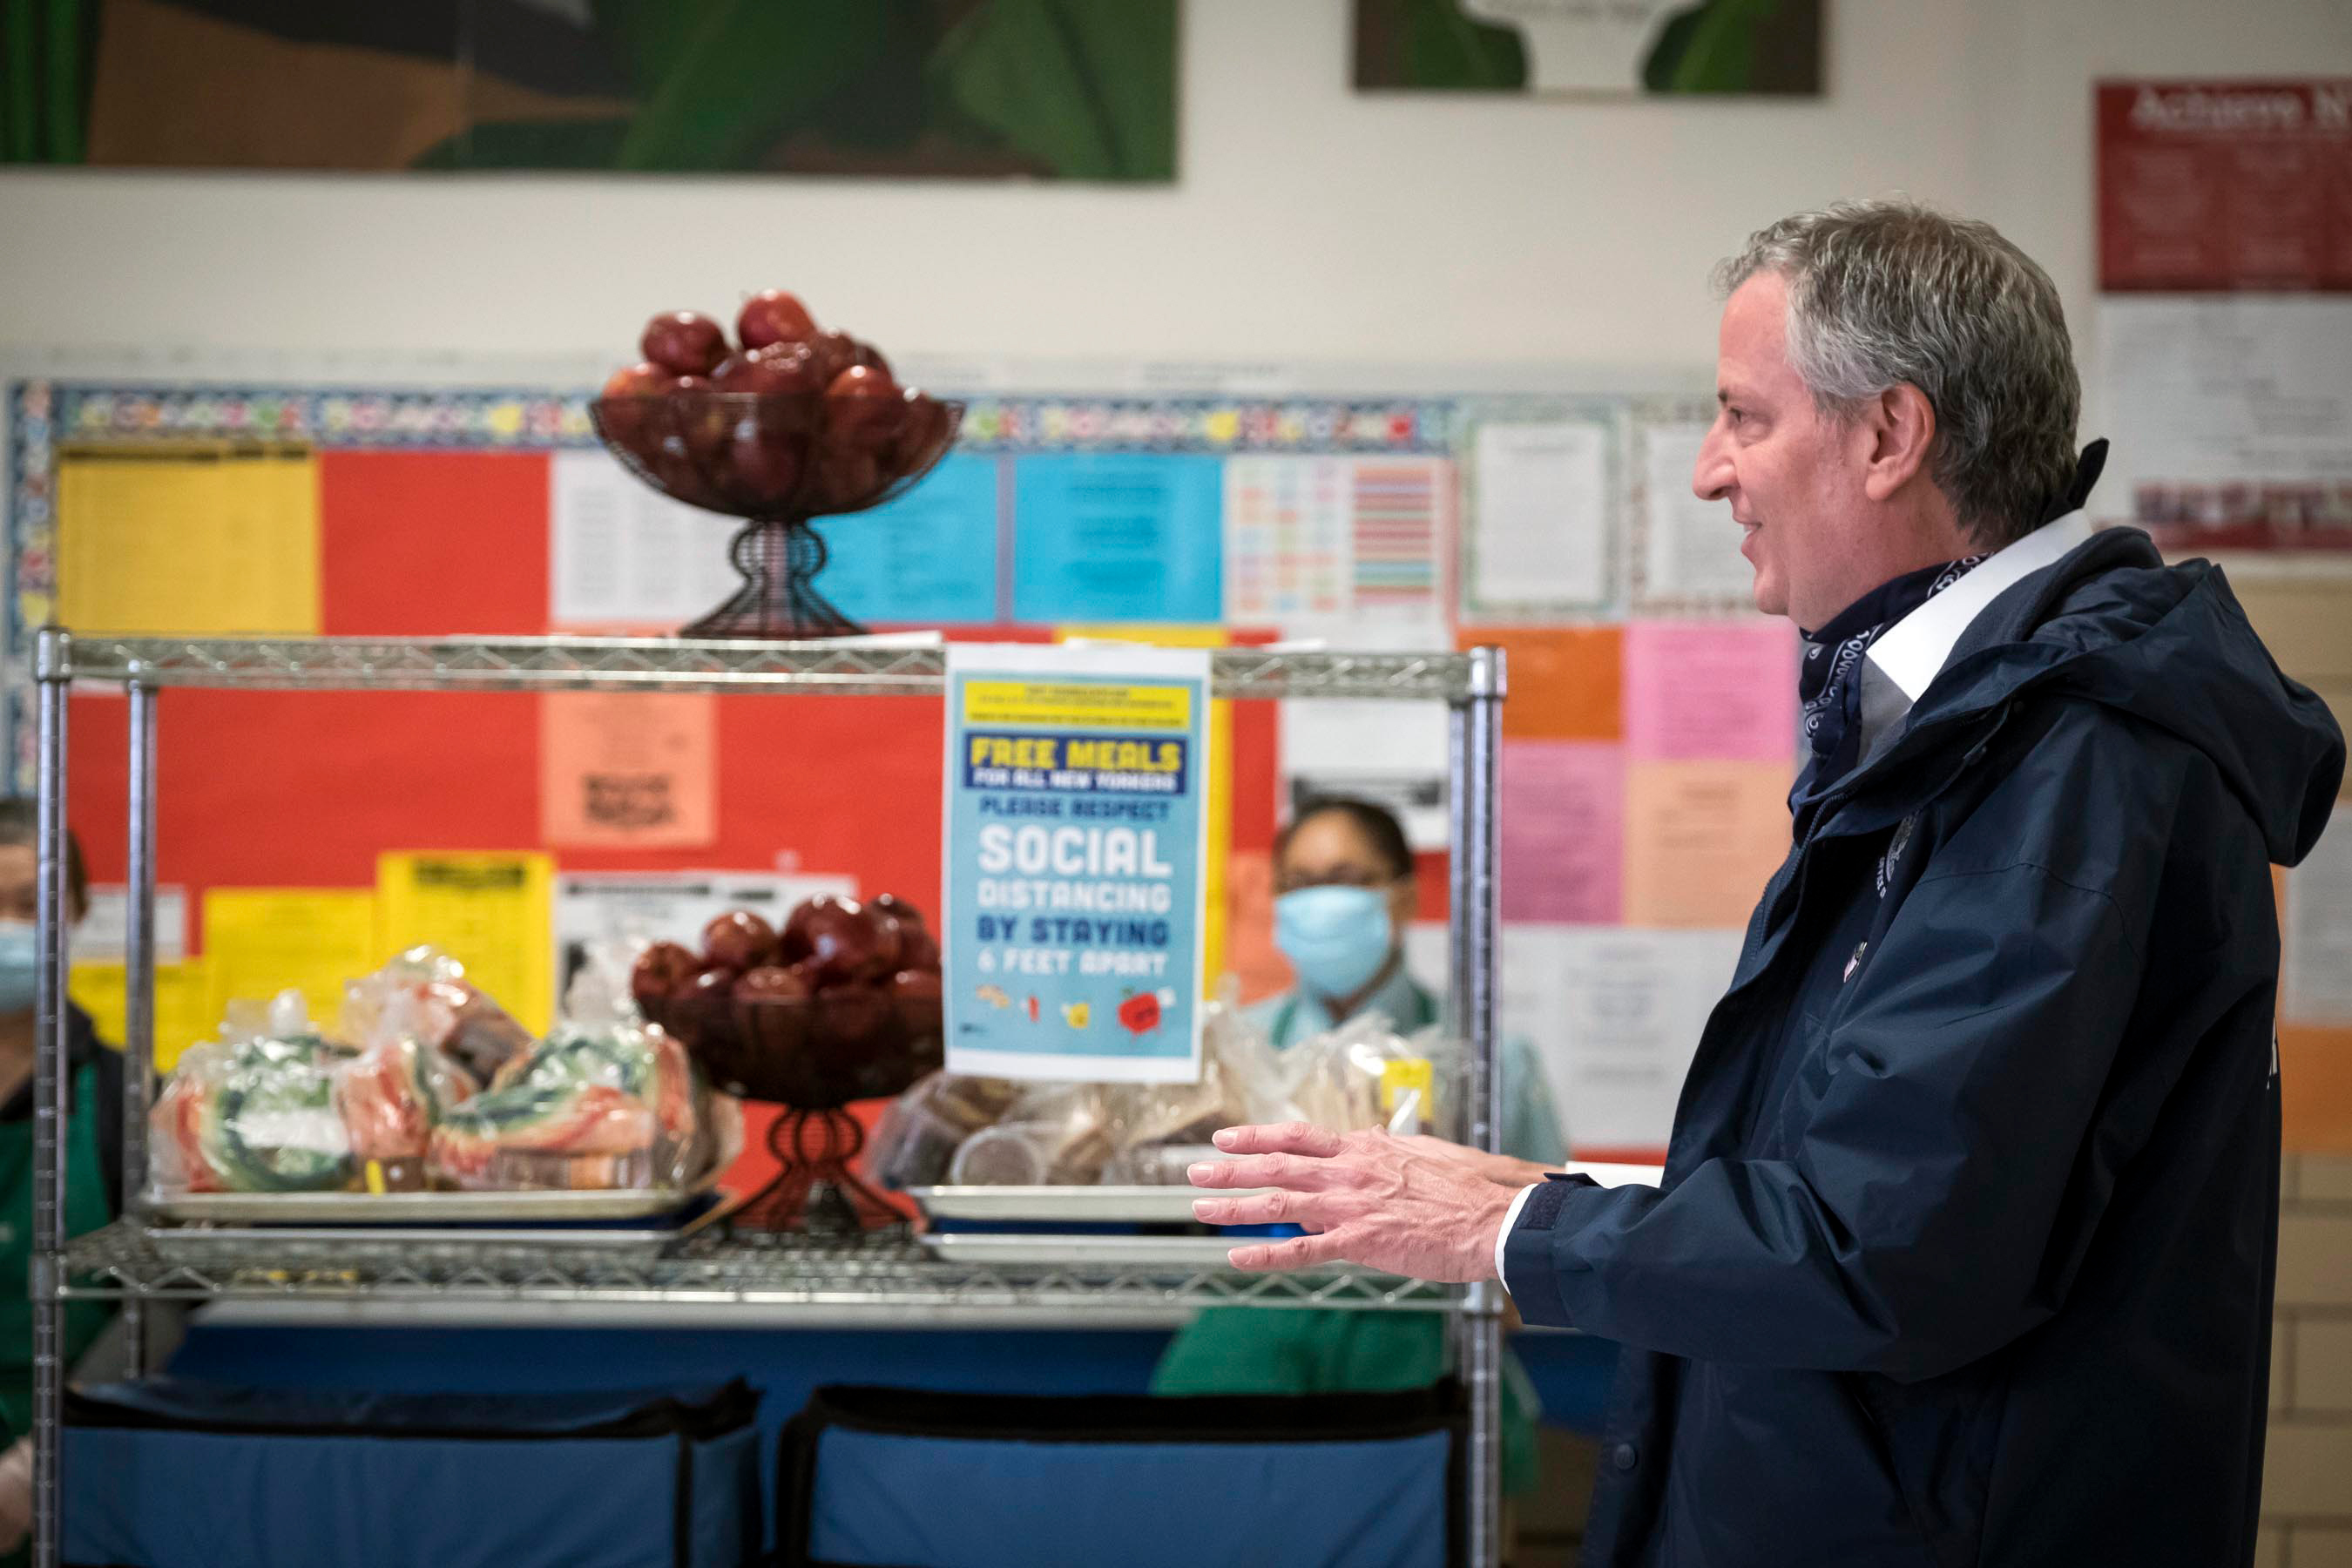 Mayor Bill de Blasio visits a free food program at PS 1 in Manhattan, April 7, 2020.